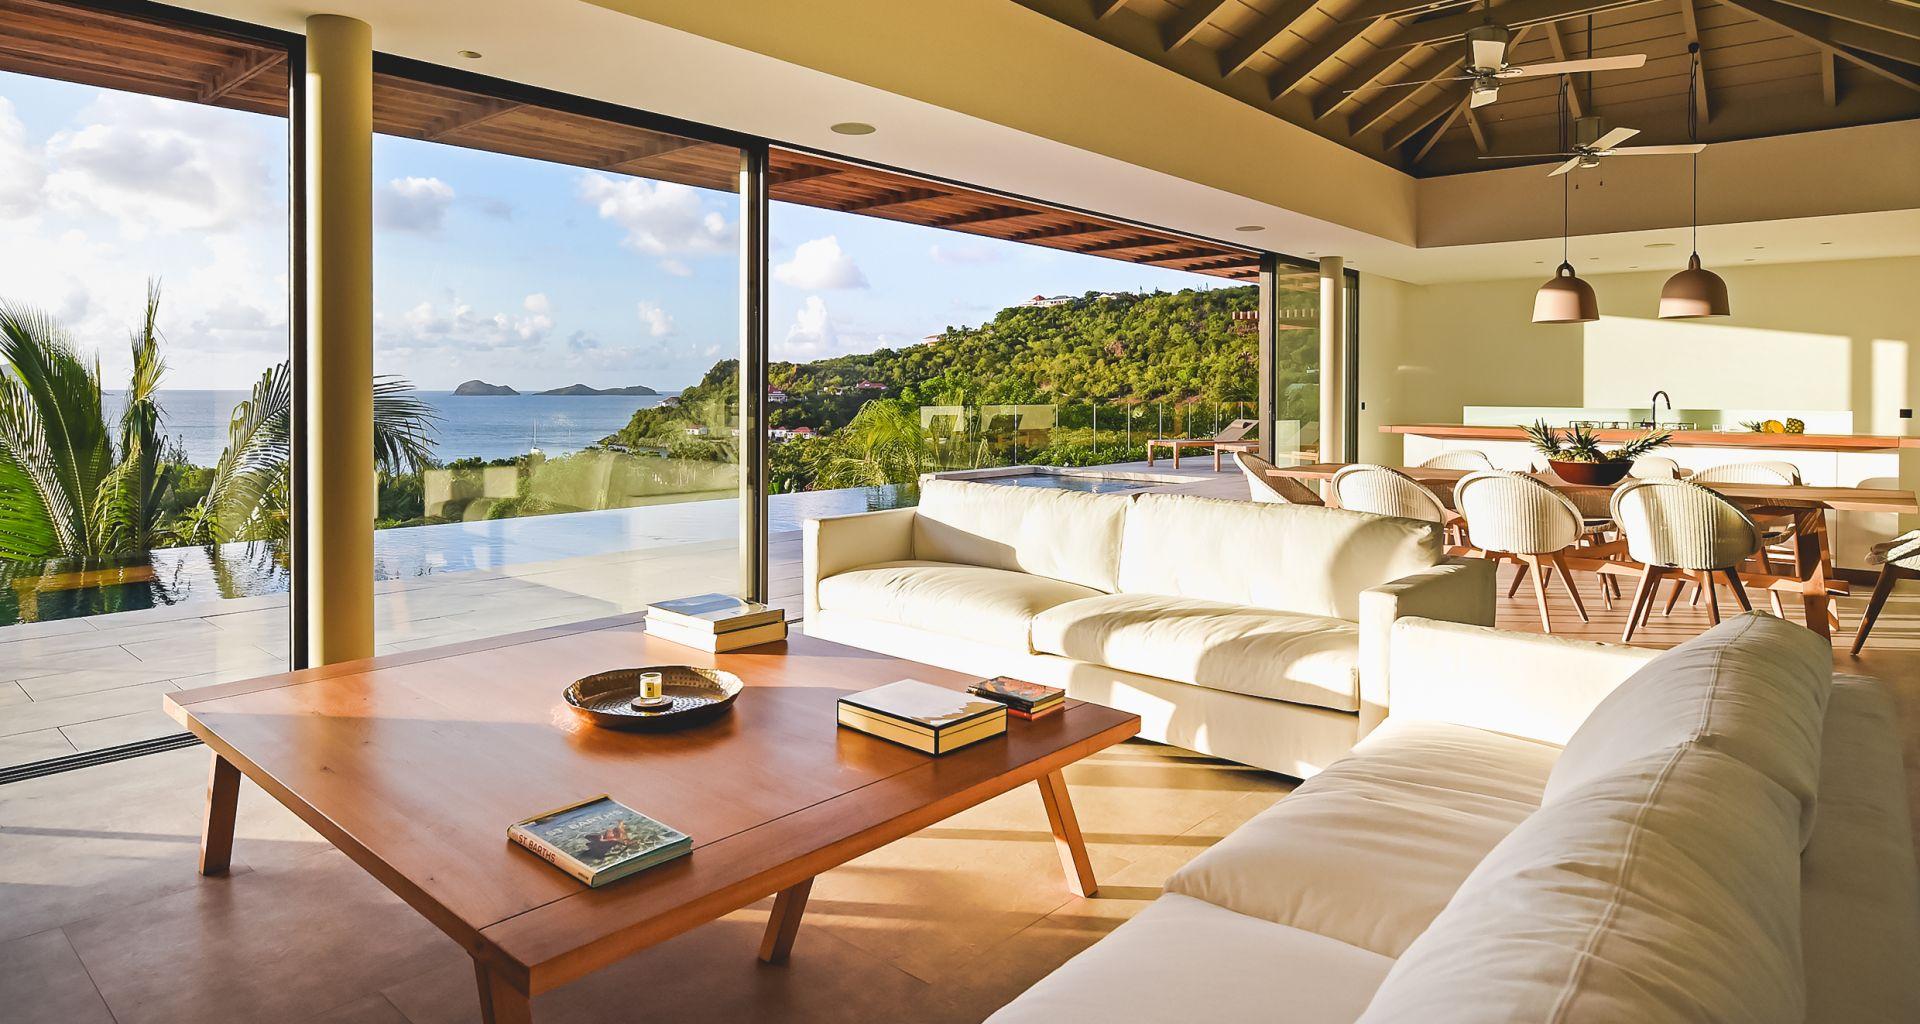 Villa Varuna, St-Barts, Caribbean